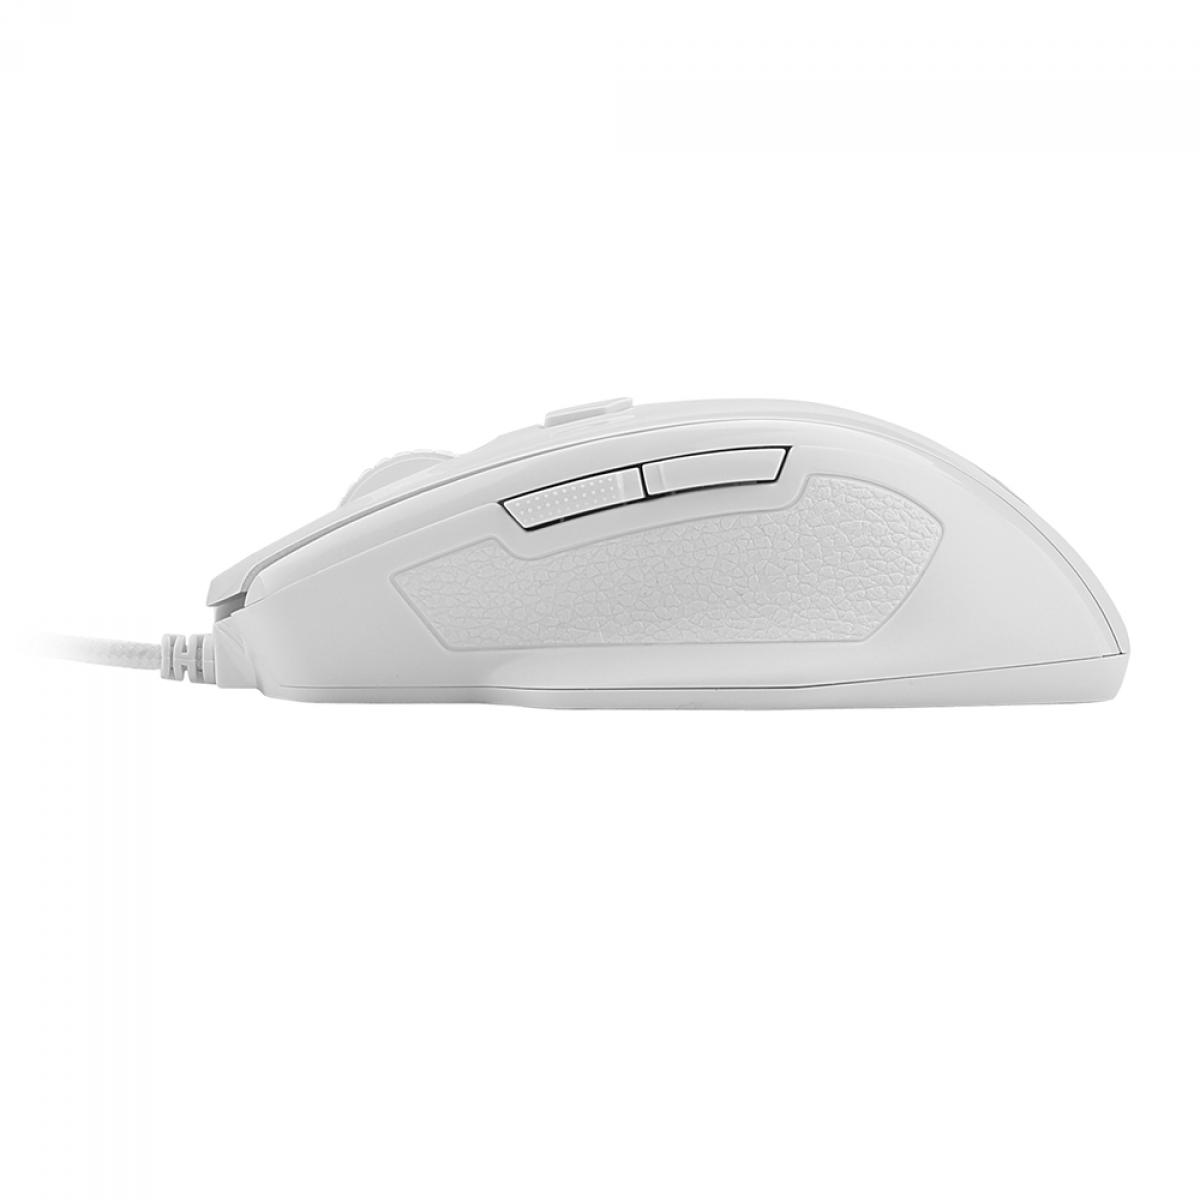 Mouse Gamer Redragon Tiger 2, 3200 DPI, 8 Botões, LED Vermelho, White, M709W